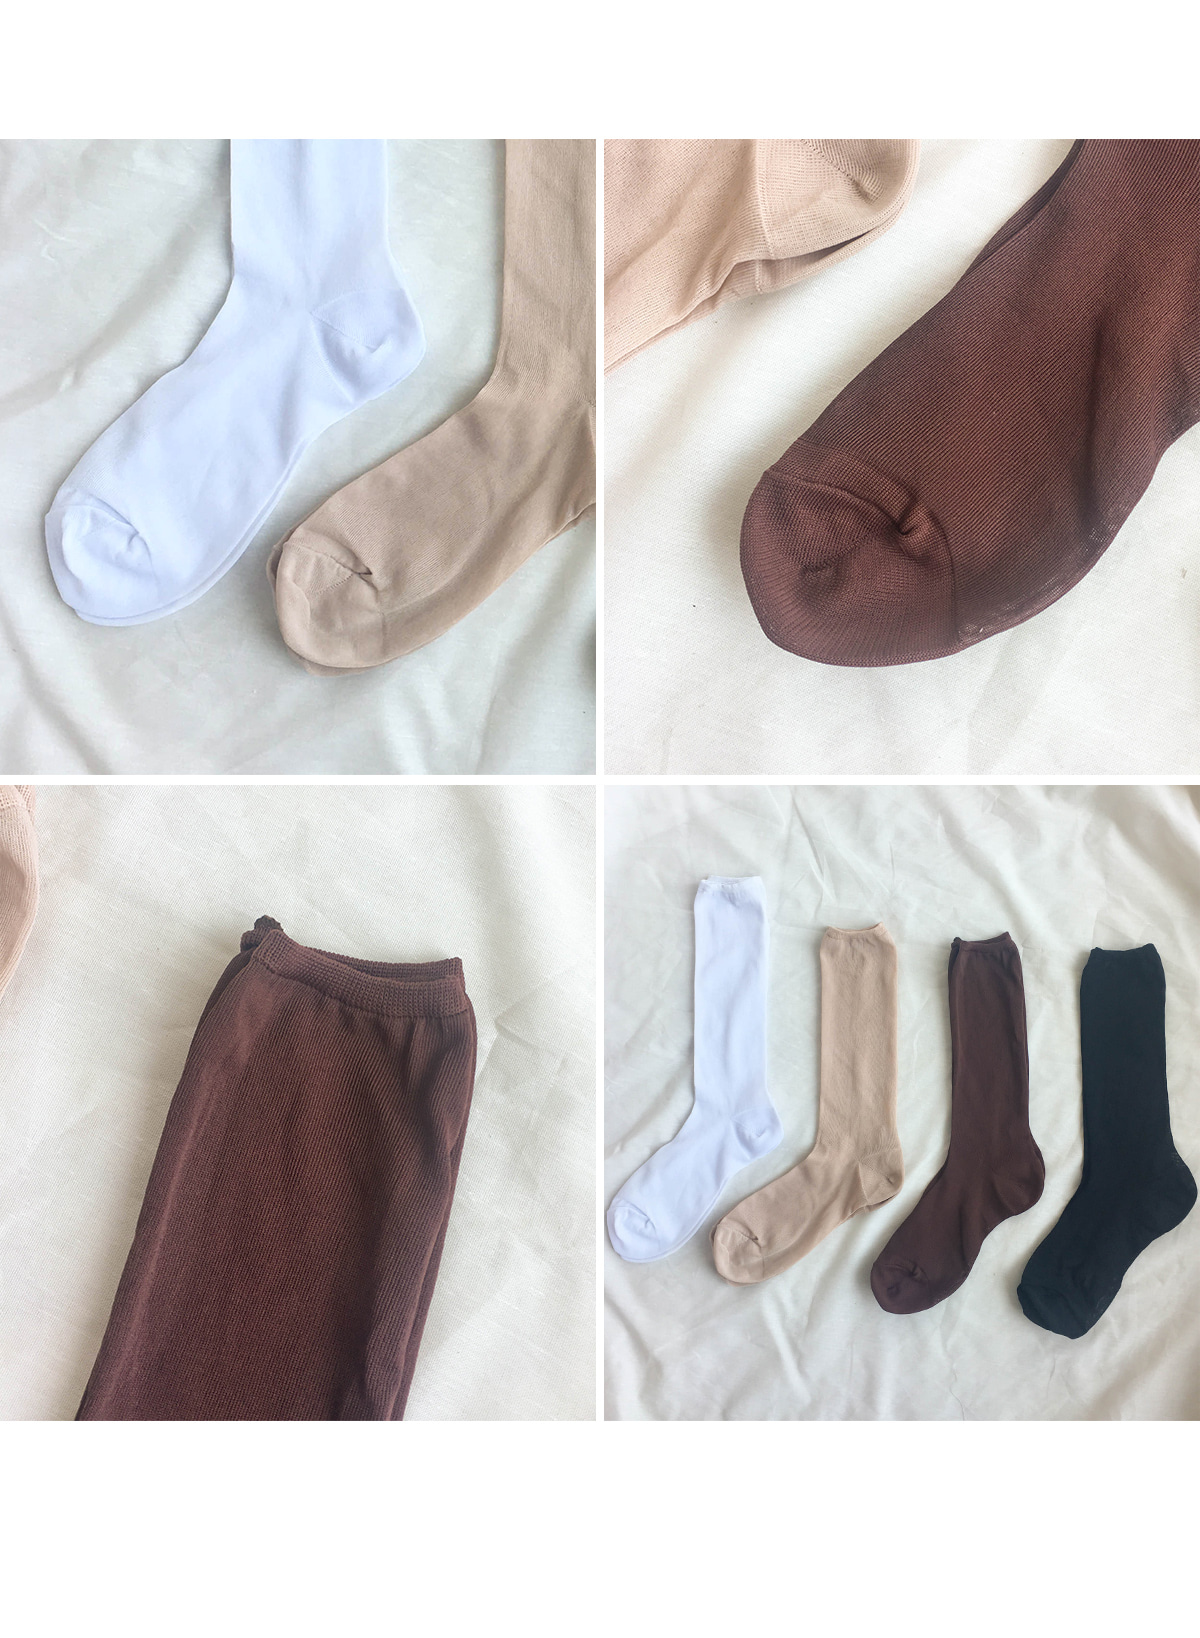 Reduce See Through Socks